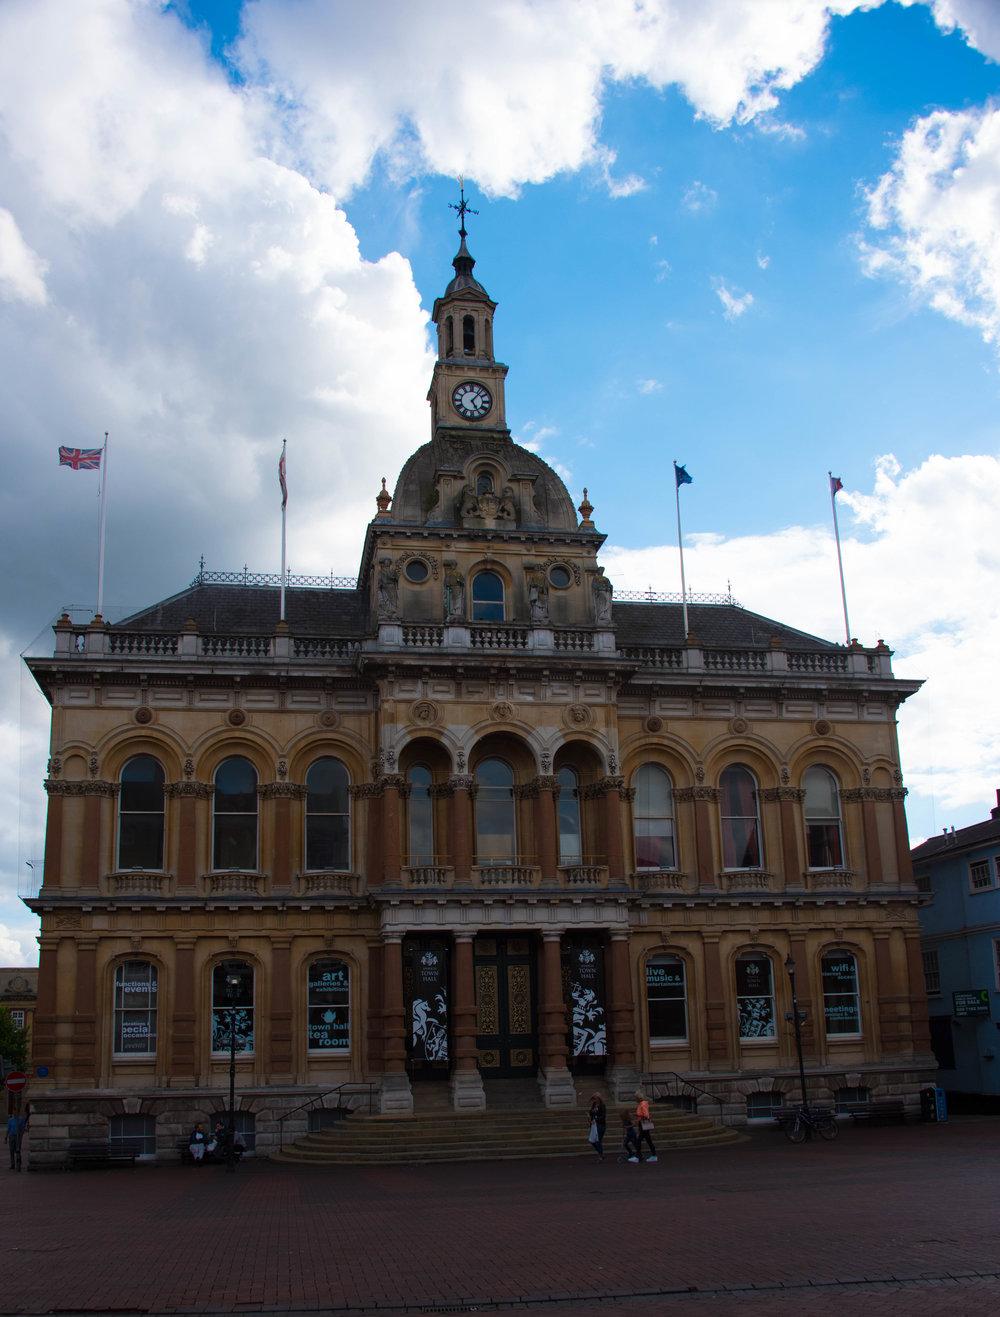 Ipswich City Hall